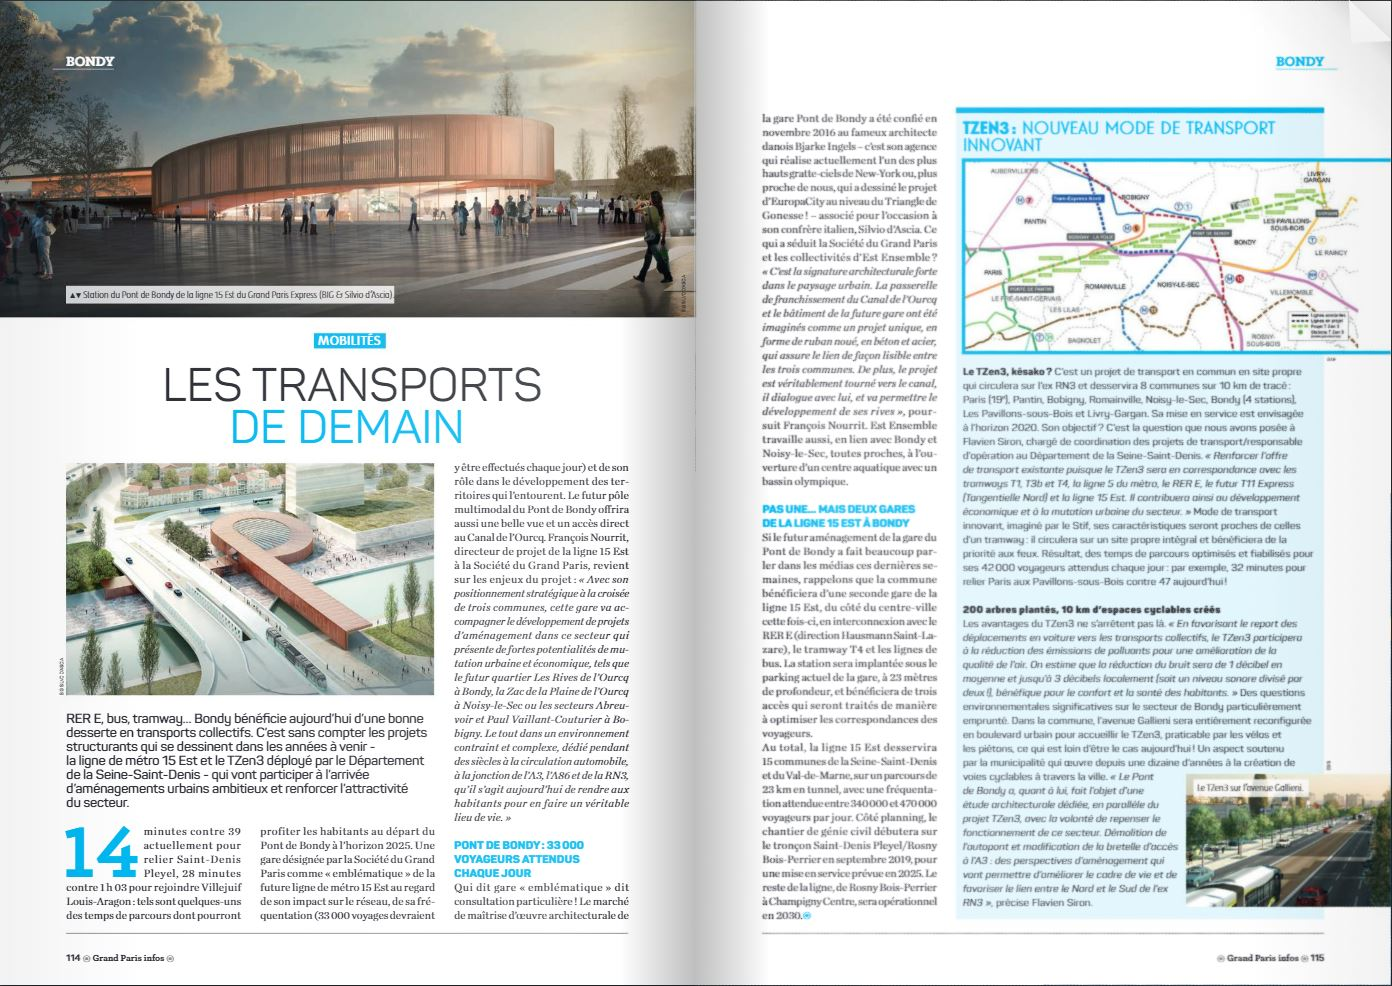 Grand Paris Infos - Les transports de demain